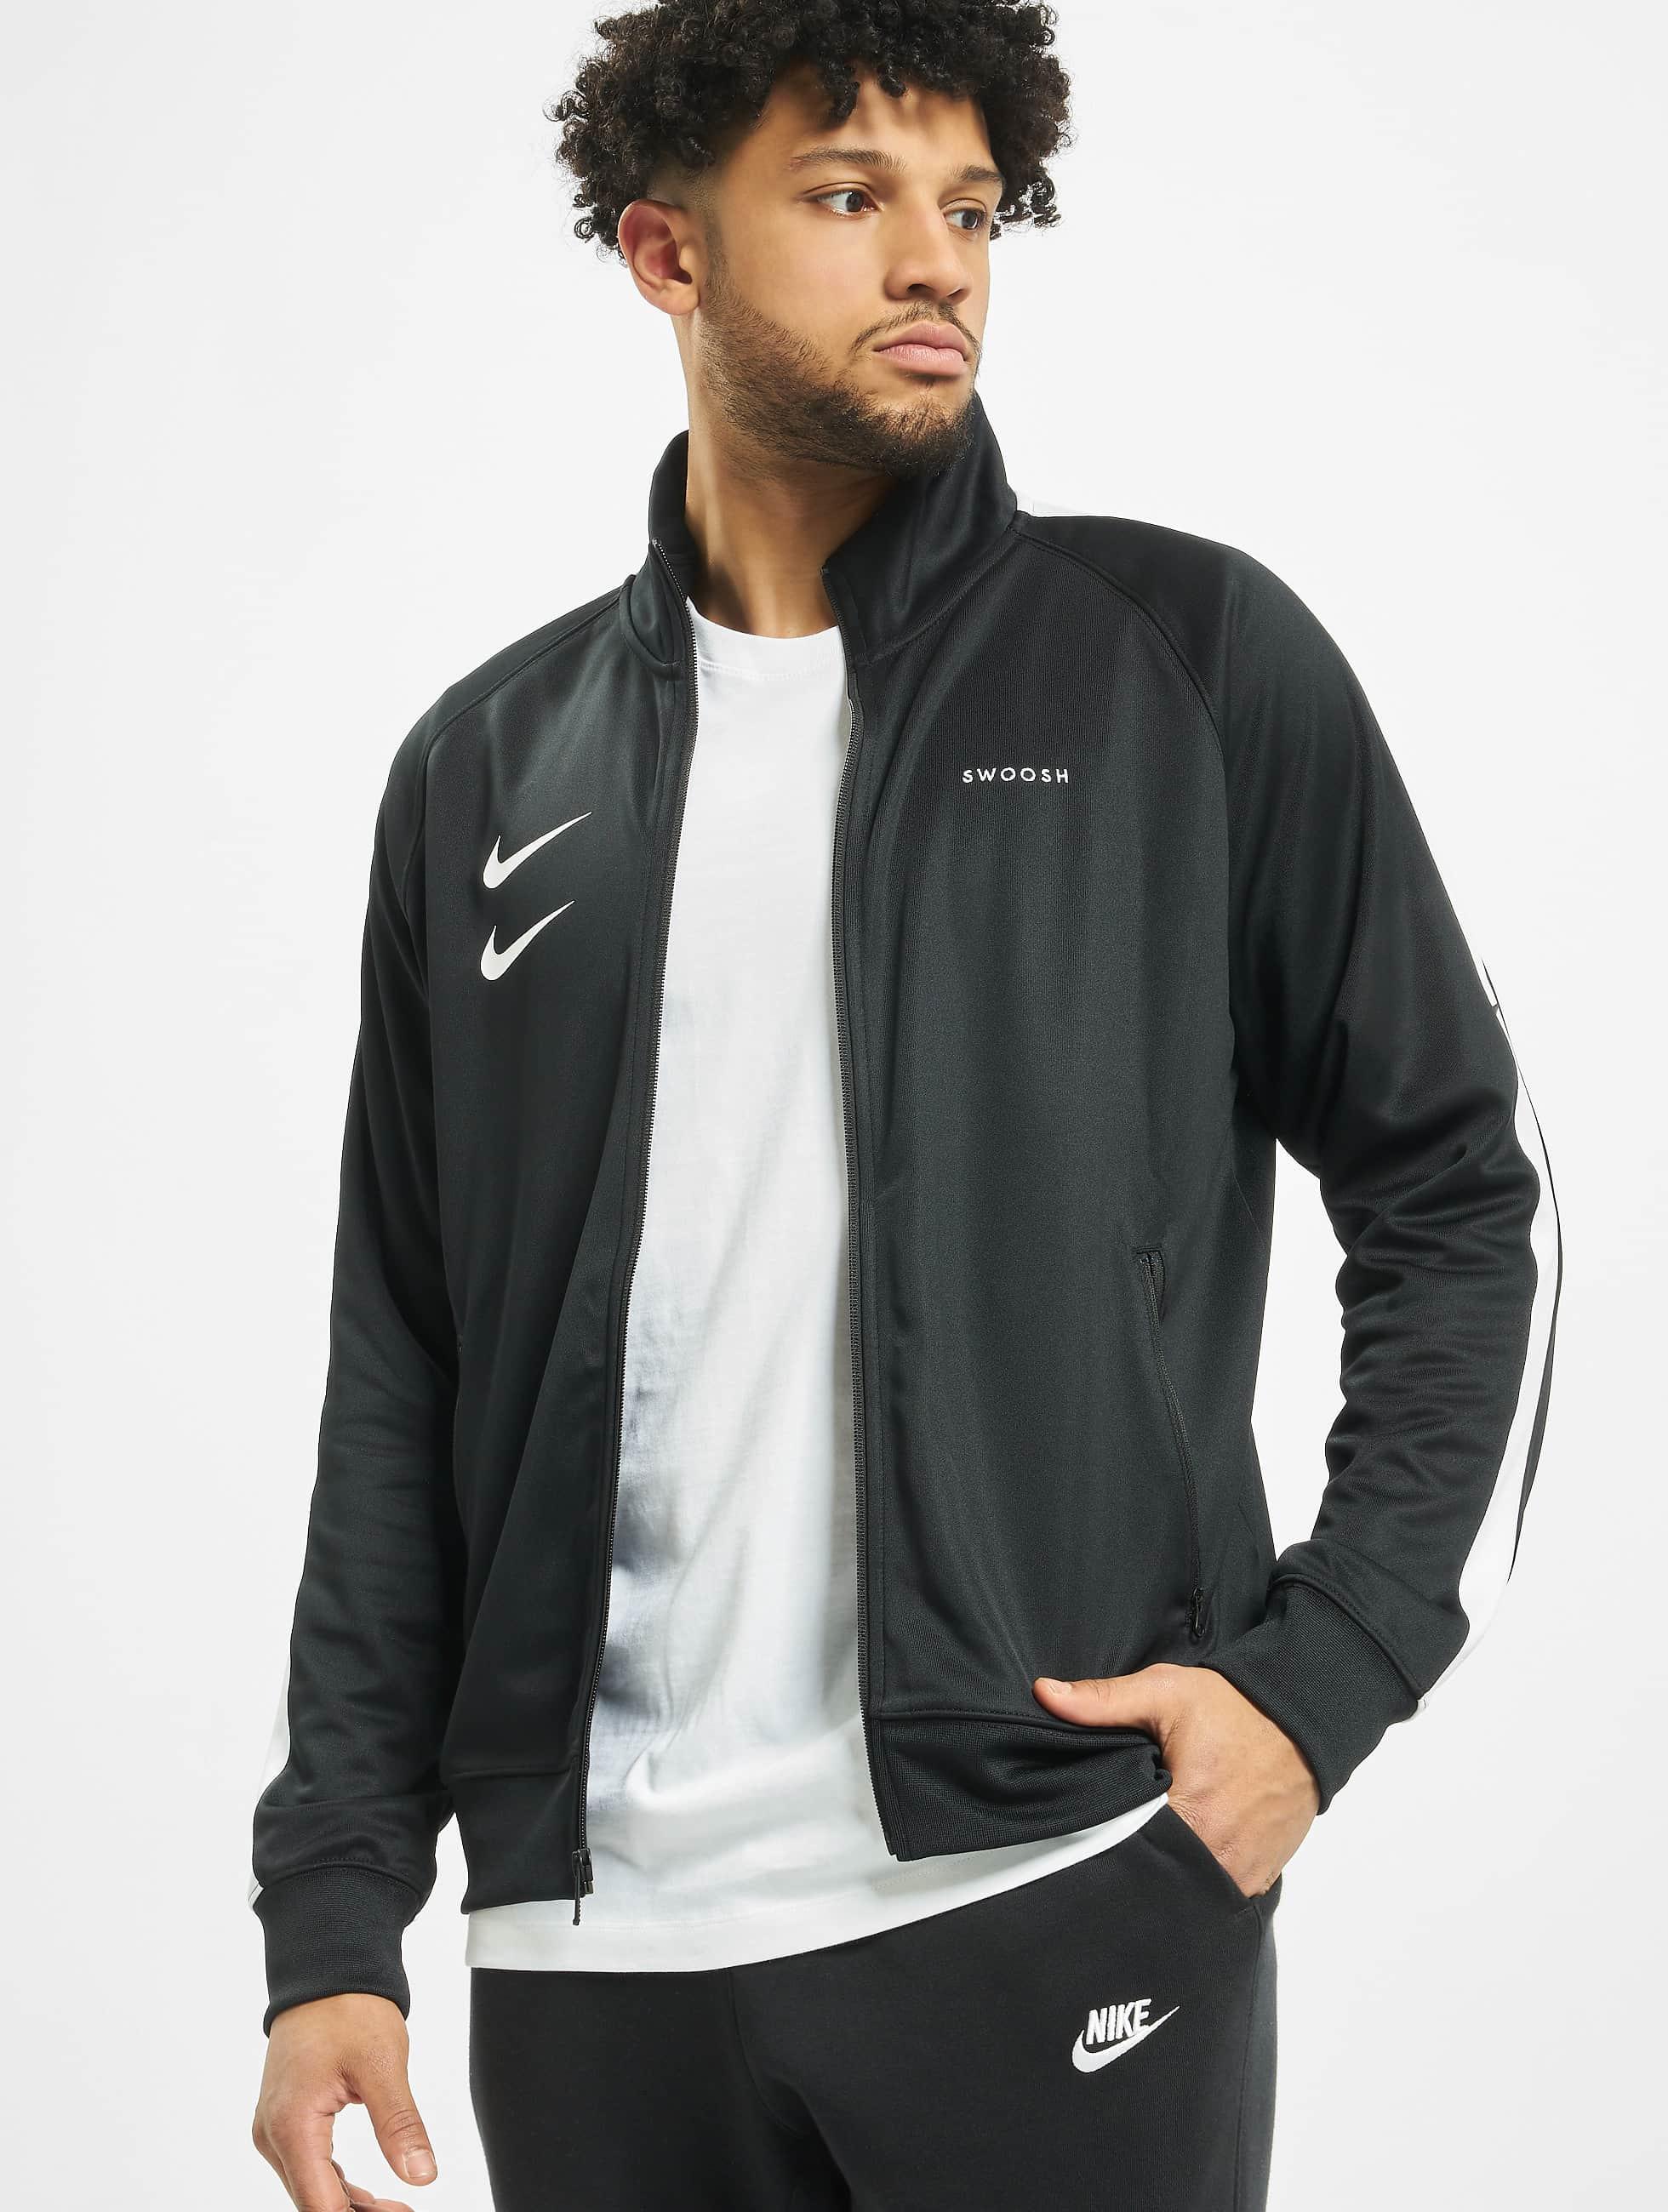 Nike Swoosh PK Transition Jacket BlackWhiteBlackWhite